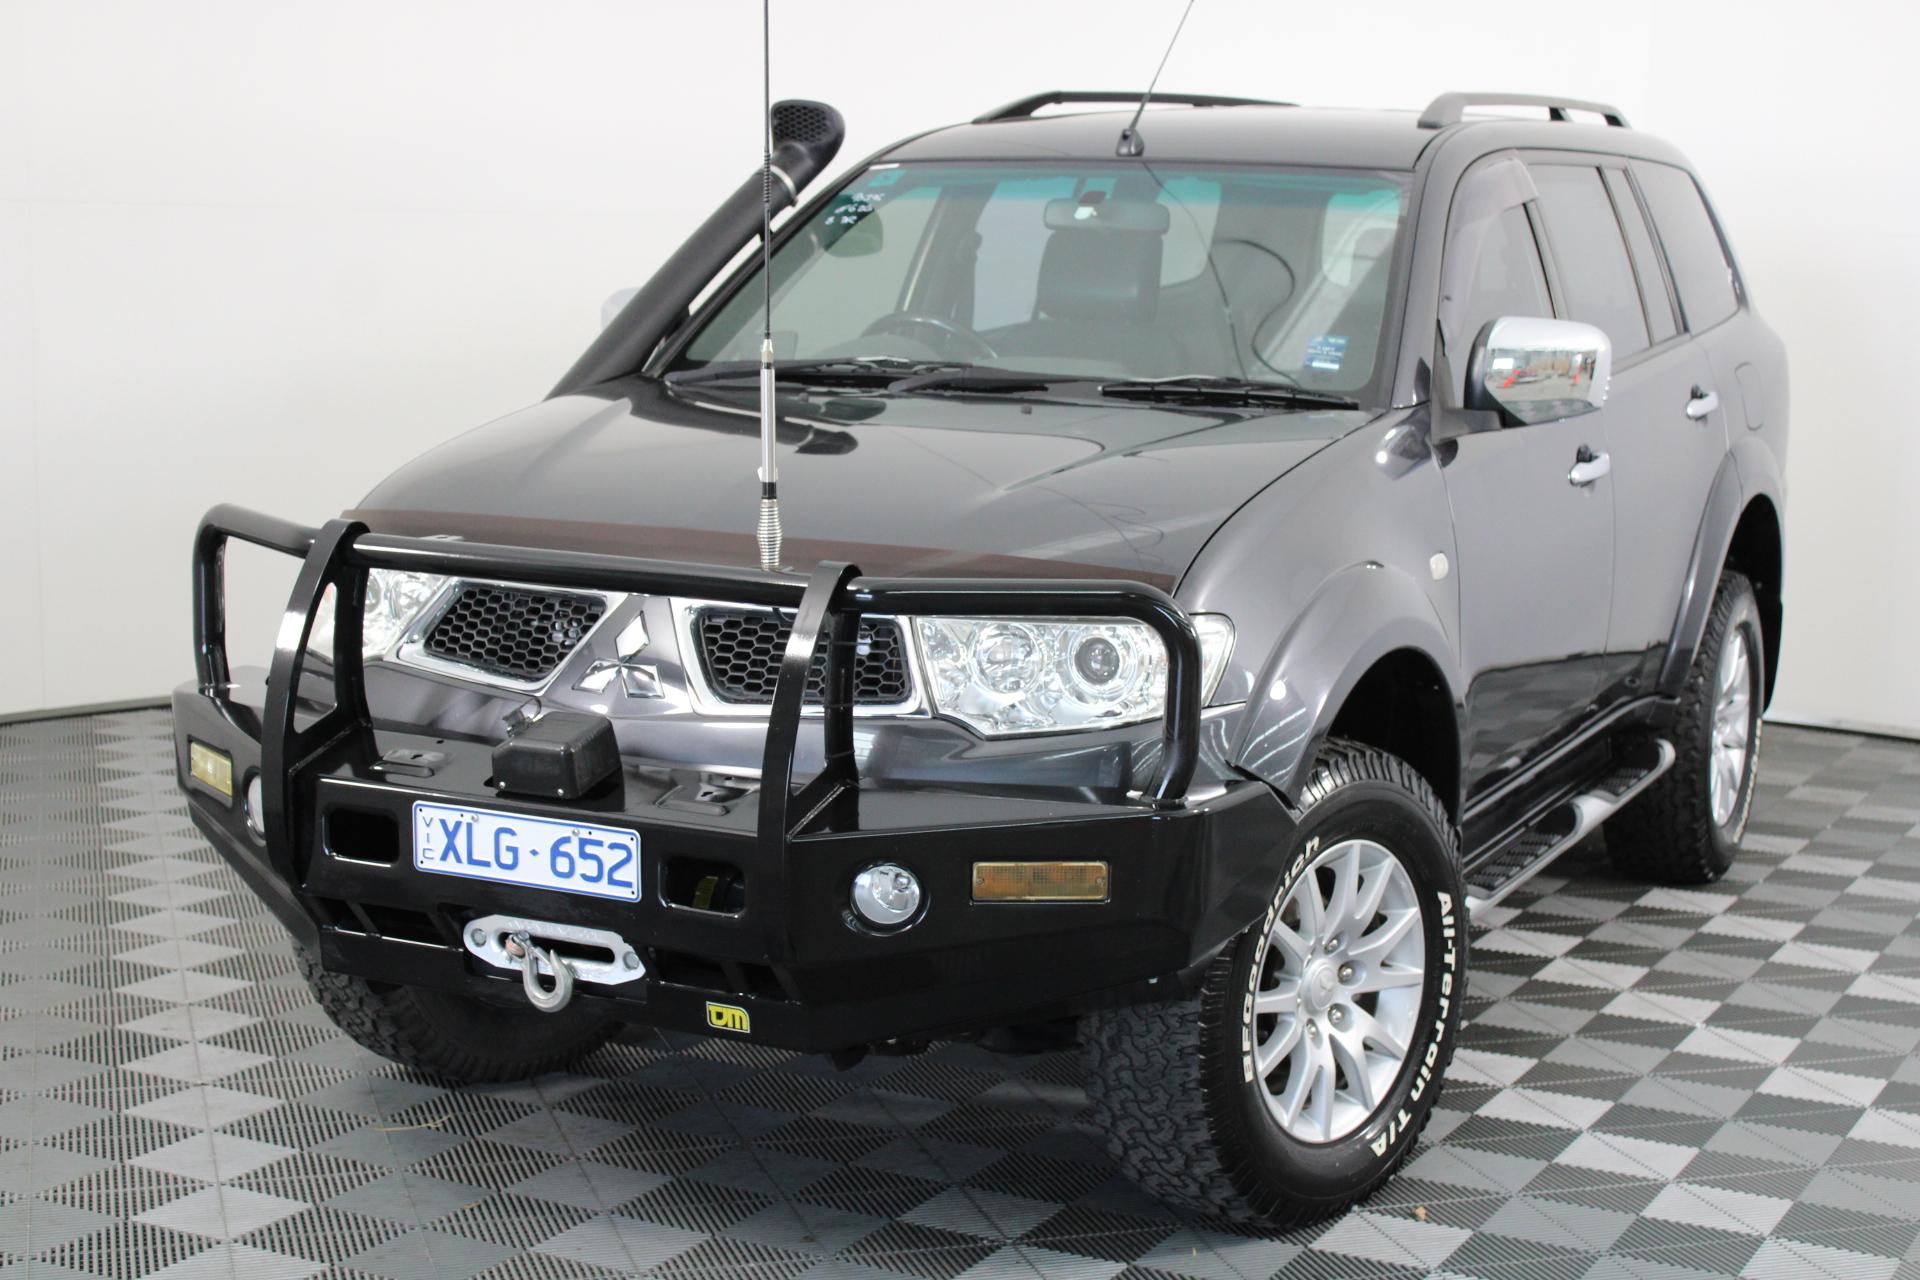 2010 Mitsubishi Challenger LS (4x4) PB Turbo Diesel Automatic 7 Seats Wagon